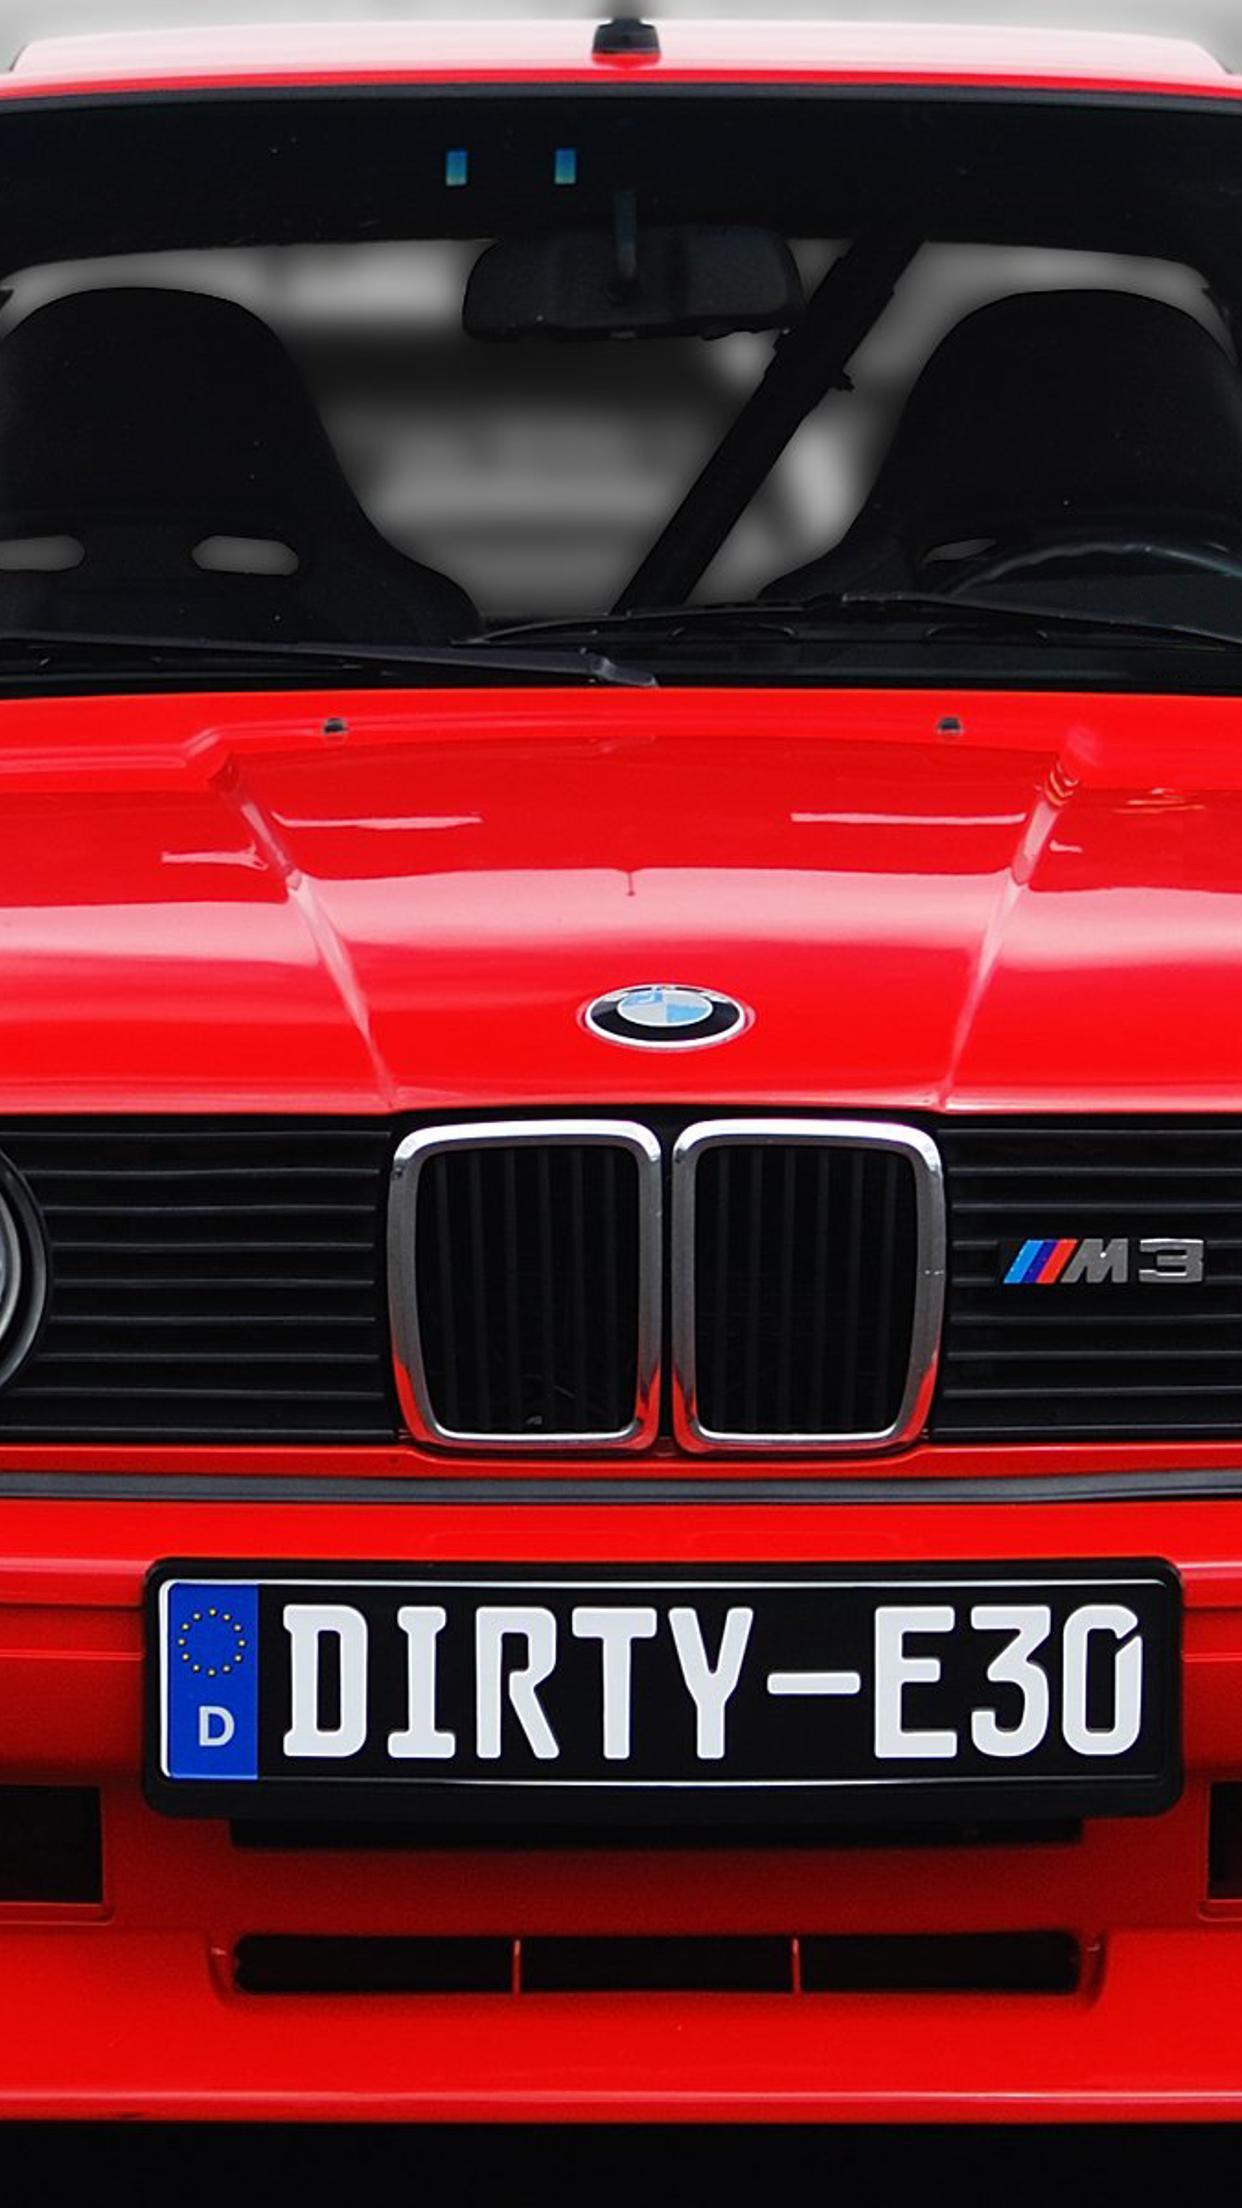 Red BMW M3 E30 - Car wallpaper